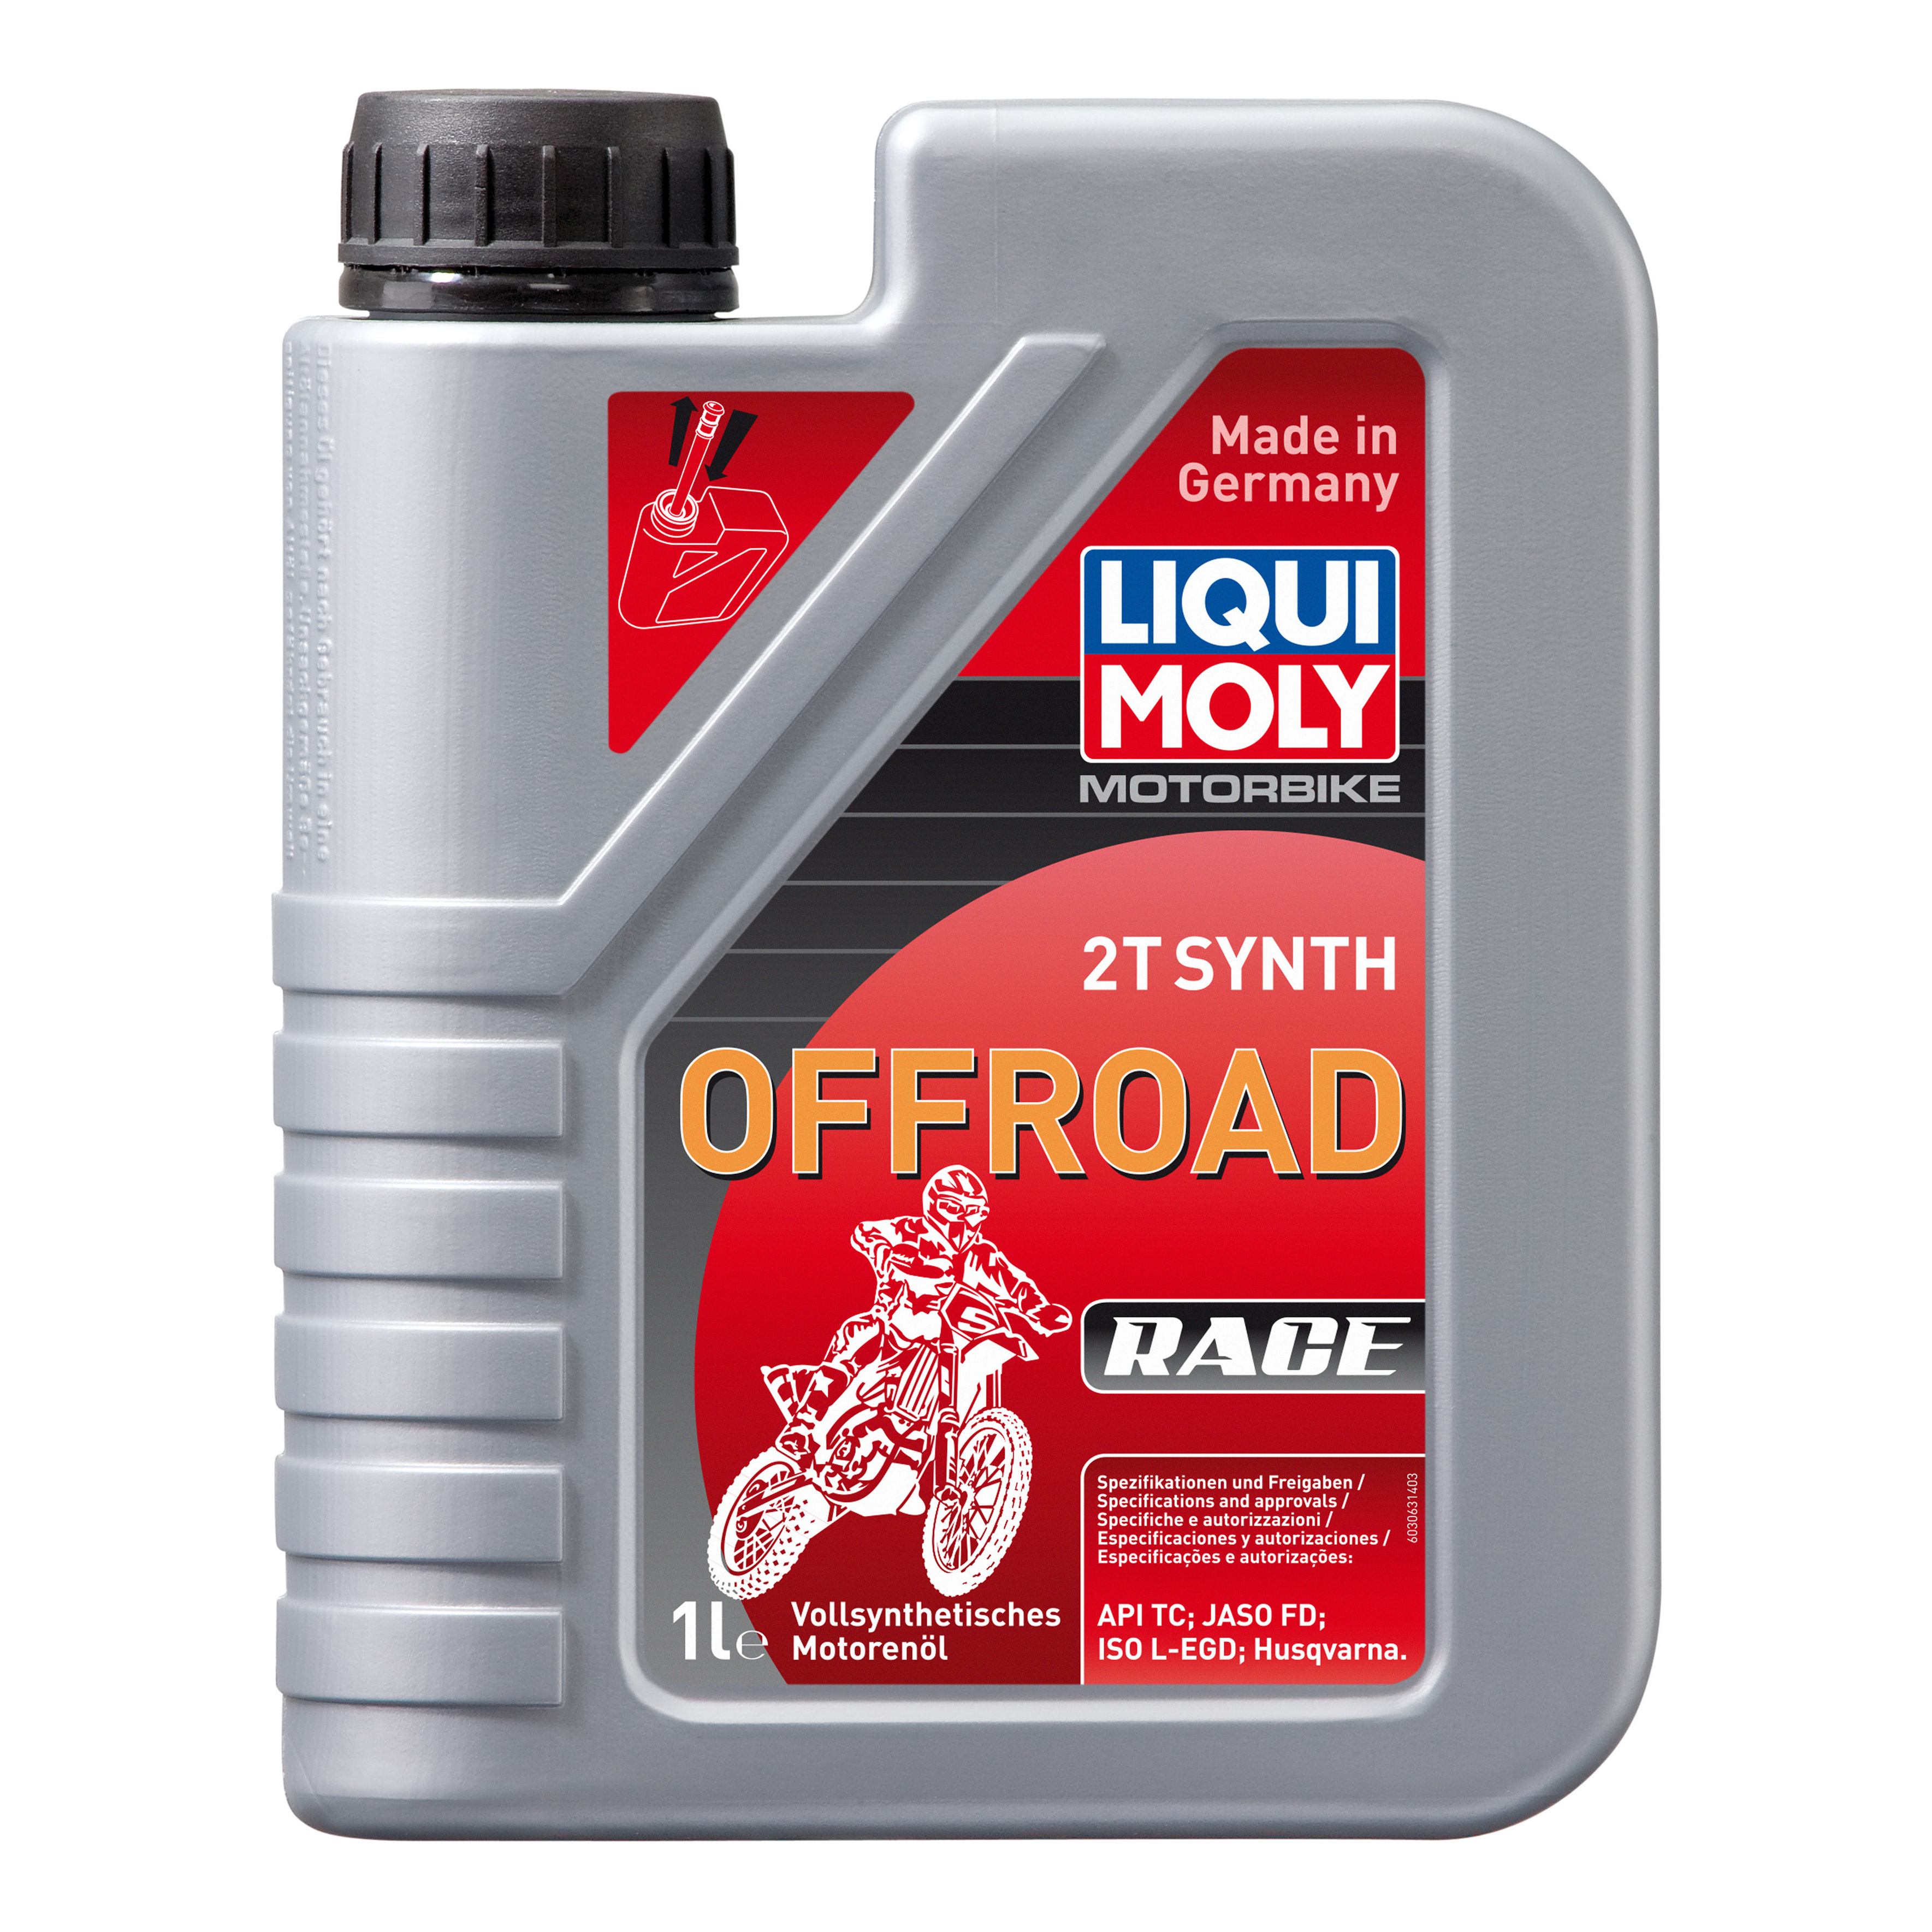 Моторное масло Liqui moly Motorbike 2T Synth Offroad Race 15W-40 1л фото